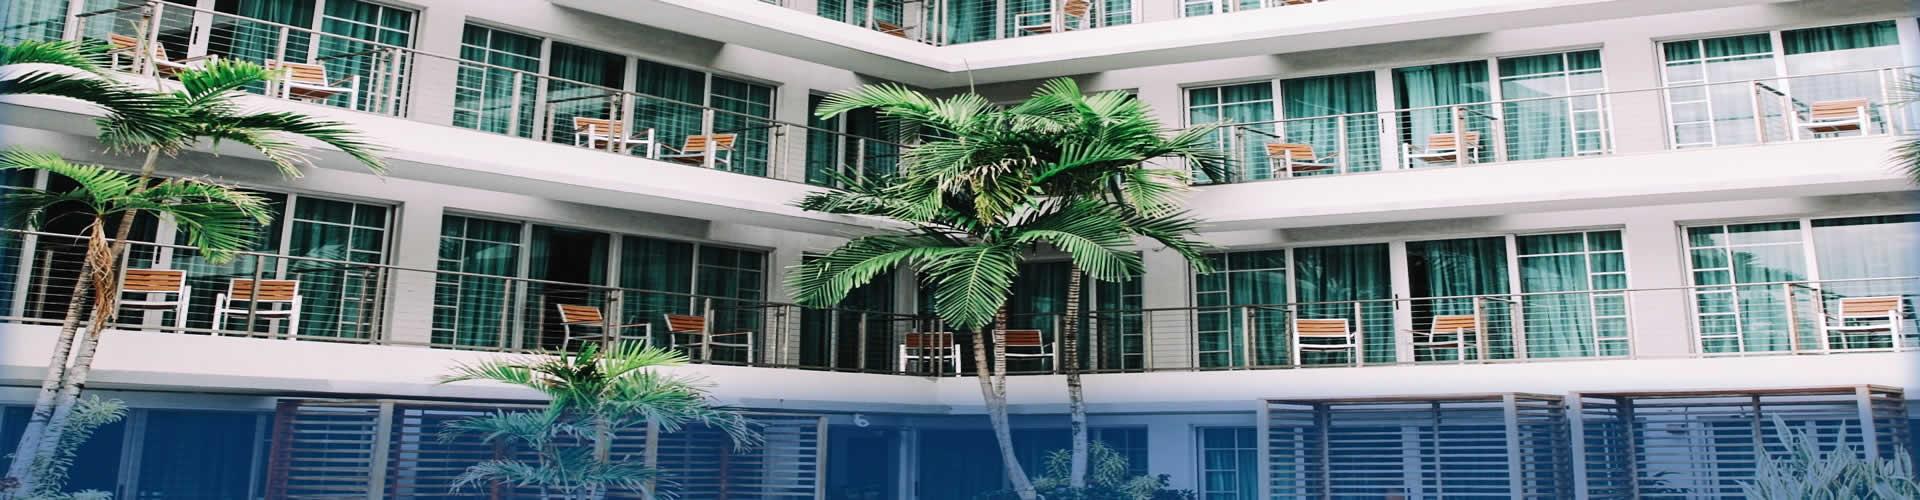 Renters Insurance Florida - iPex Insurance